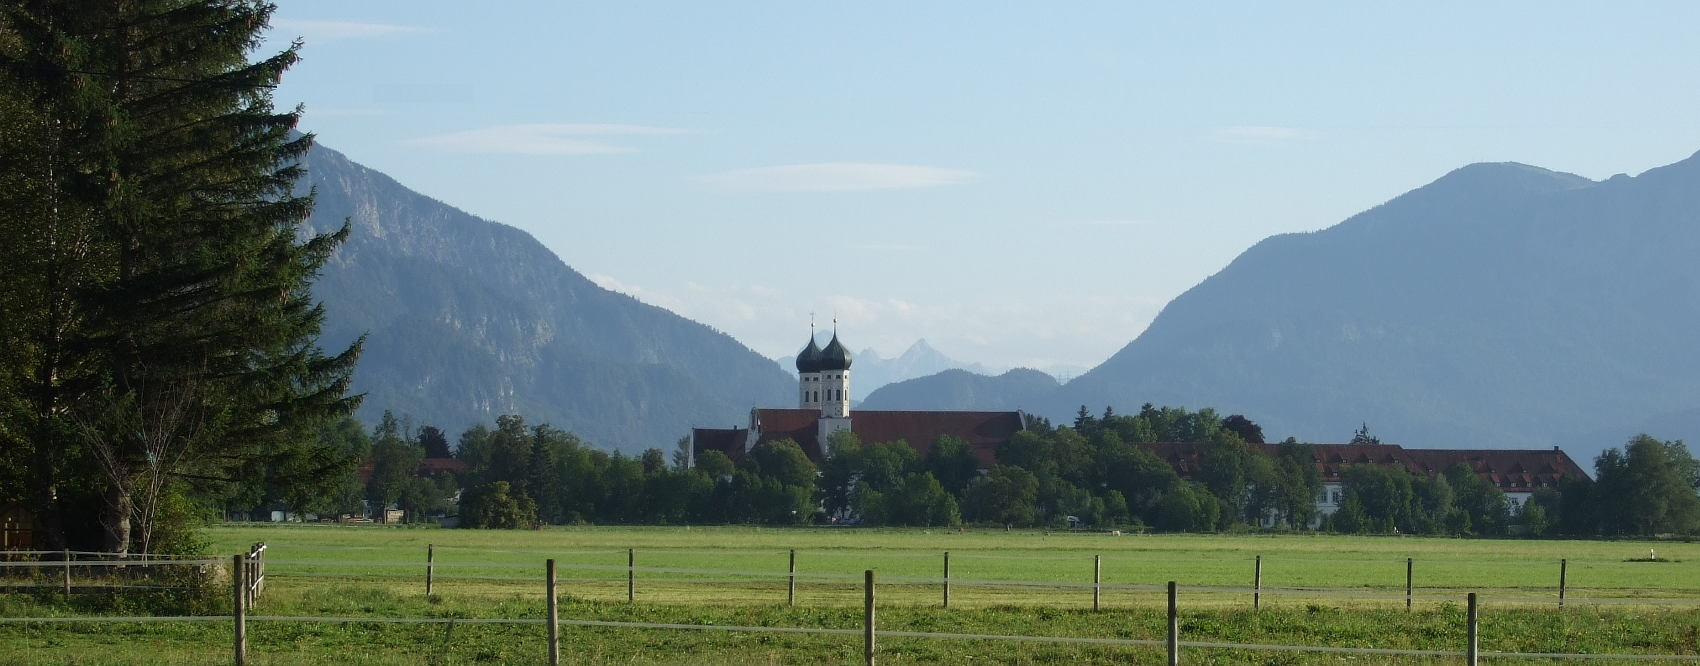 Fahrradtour Benediktbeuern - Grossweil